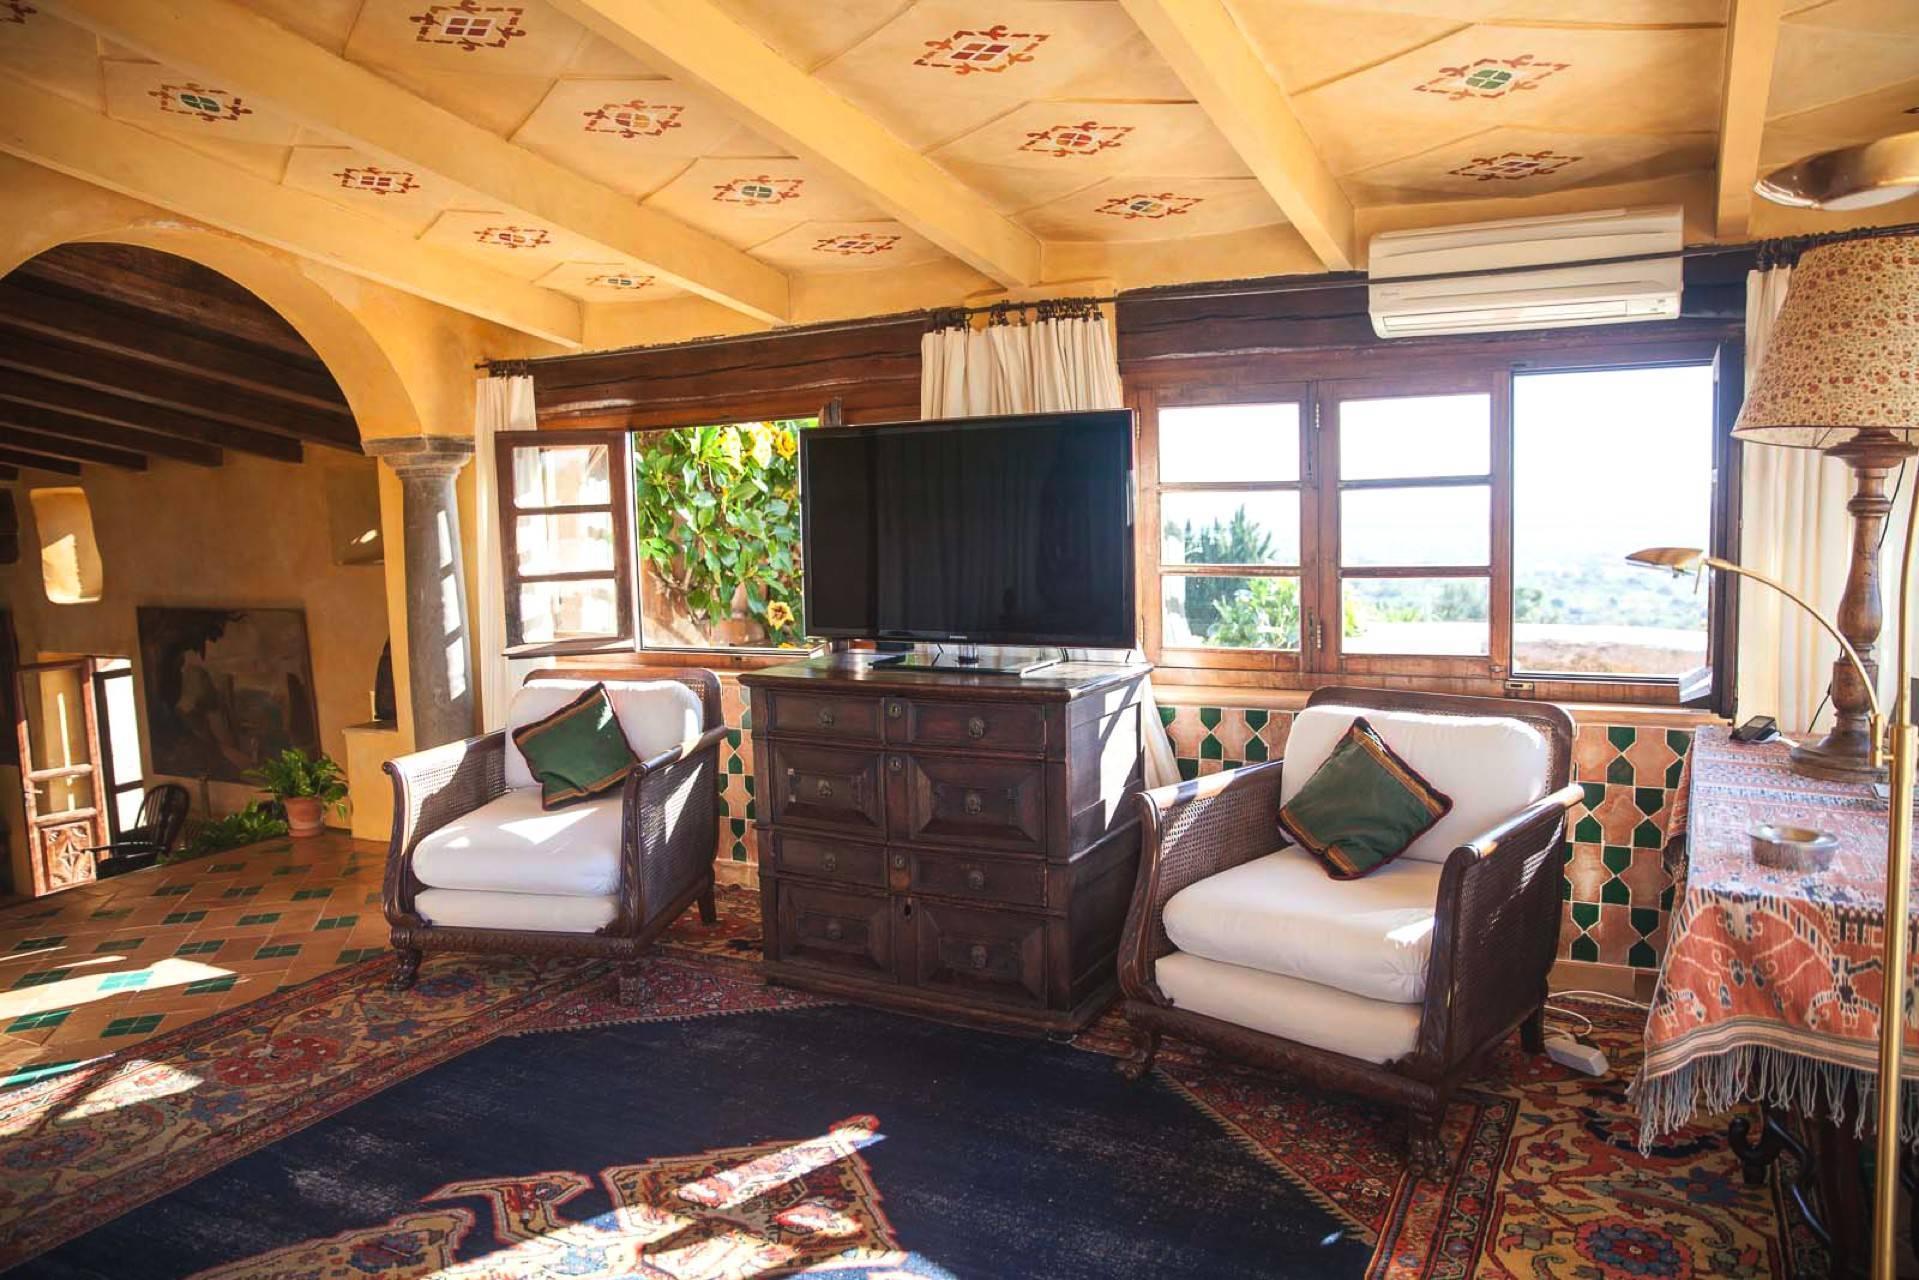 01-116 extravagante luxus Finca Mallorca Süden Bild 16